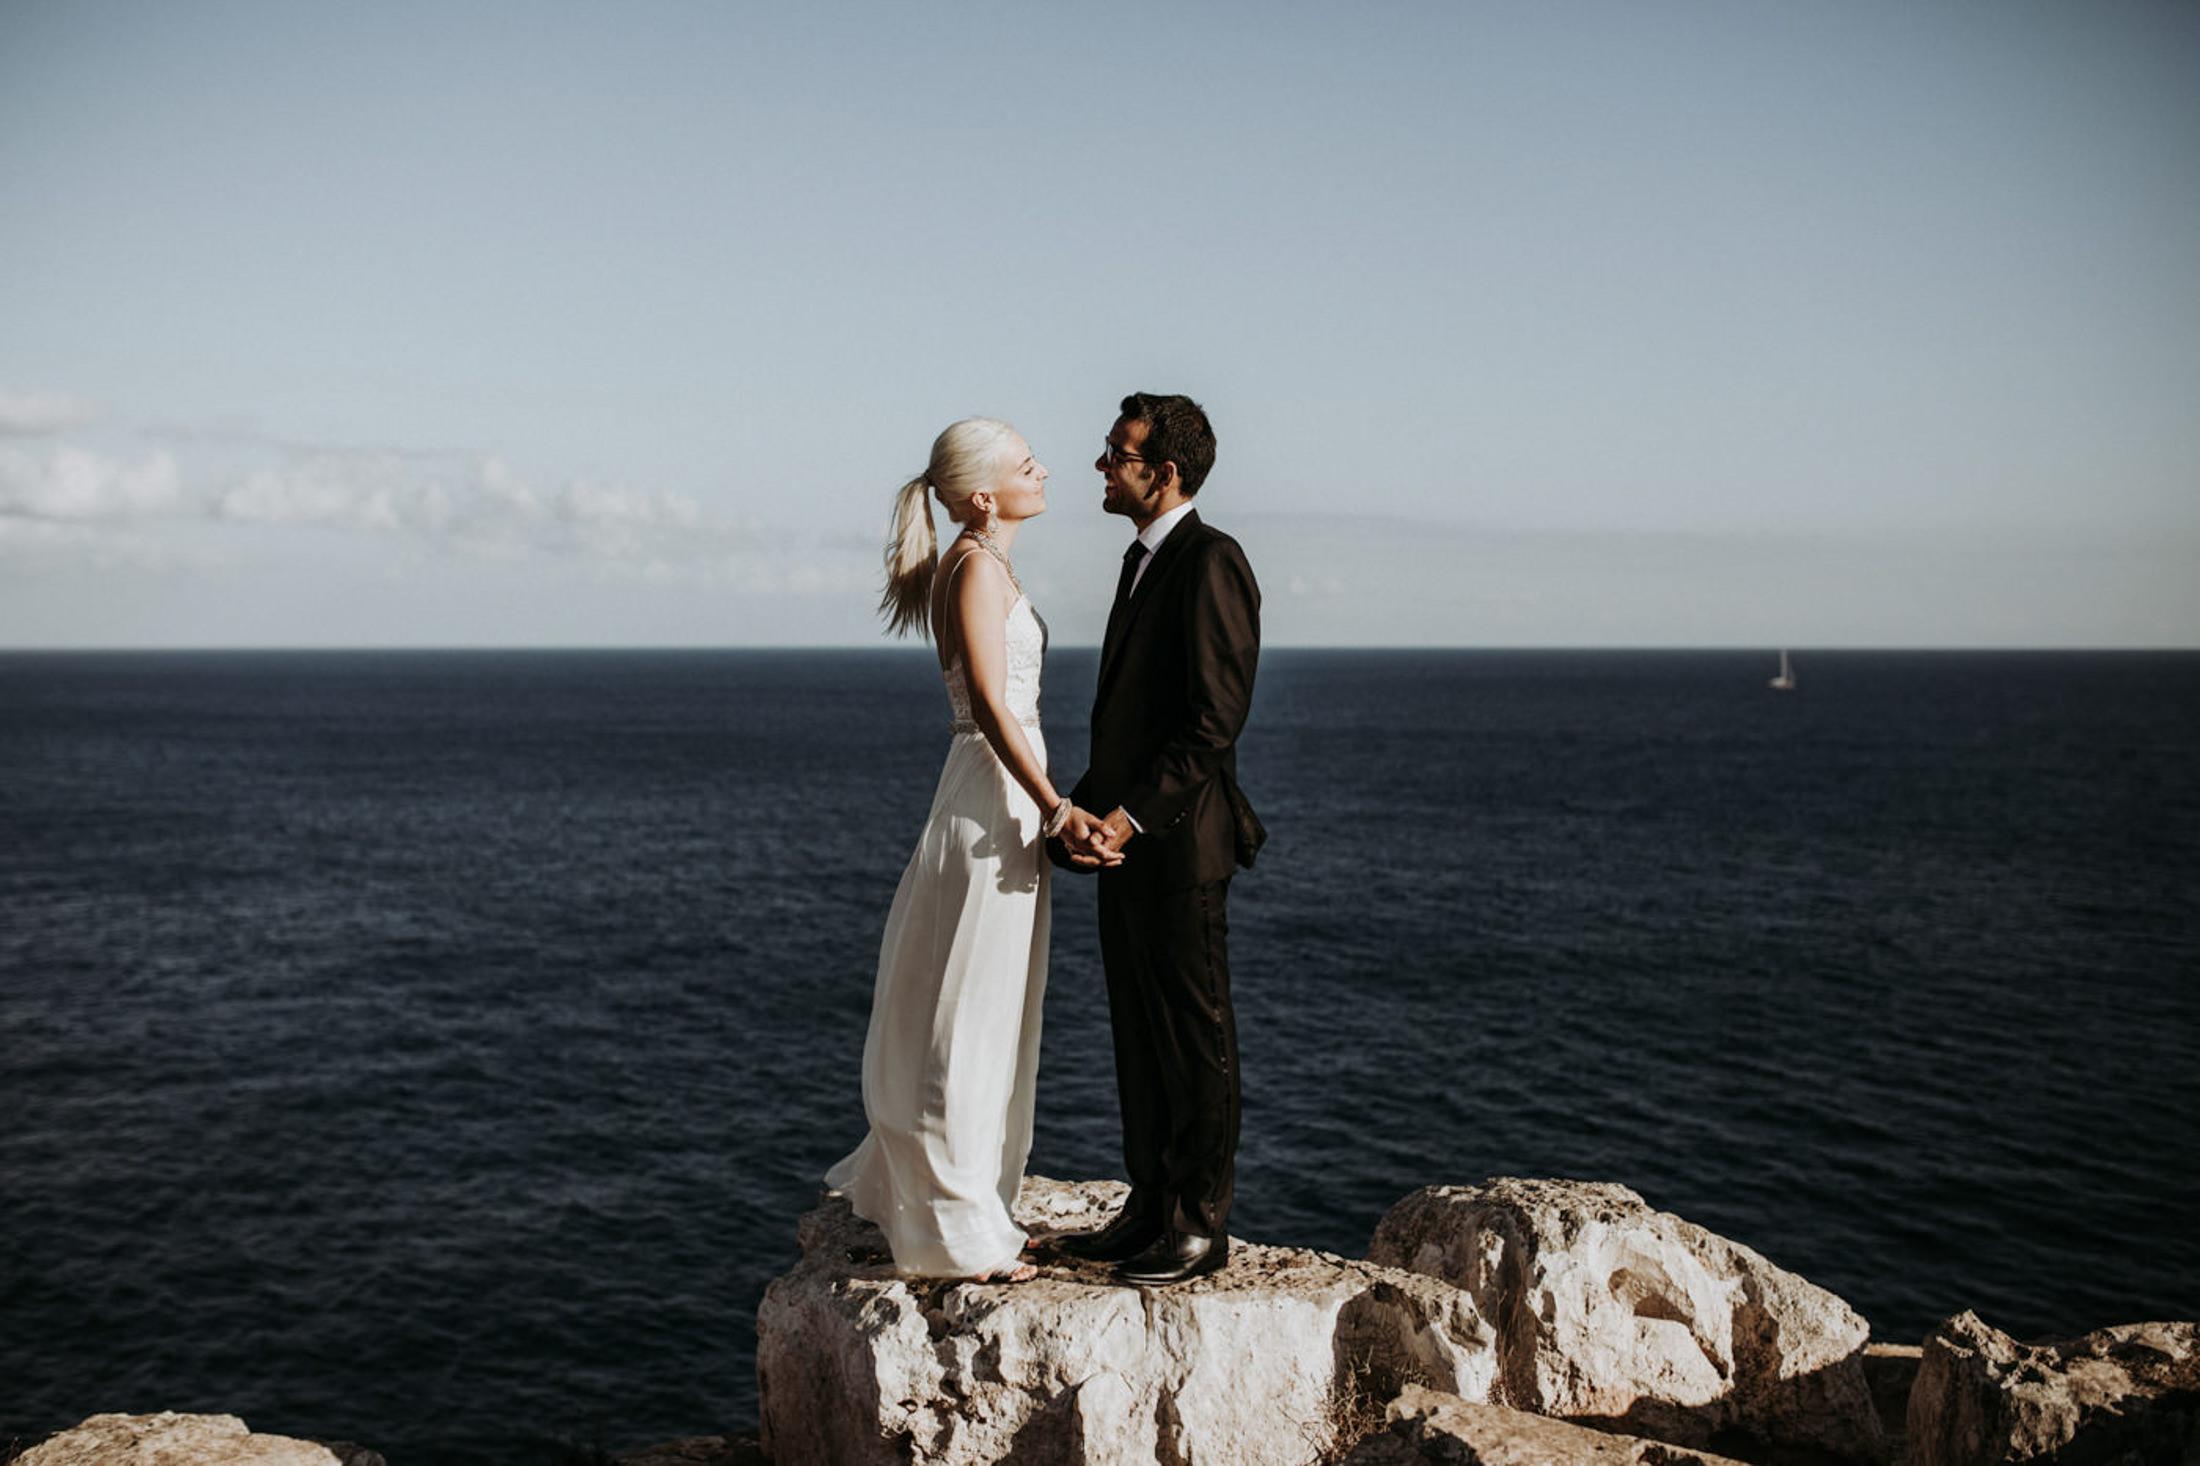 Wedding_Photographer_Mallorca_Daniela-Marquardt_Photography_New_York_Iceland_Tuscany_Santorini_Portugal_Austria_Bavaria_Elopement_Hochzeitsfotograf_AntjeRajat2_90